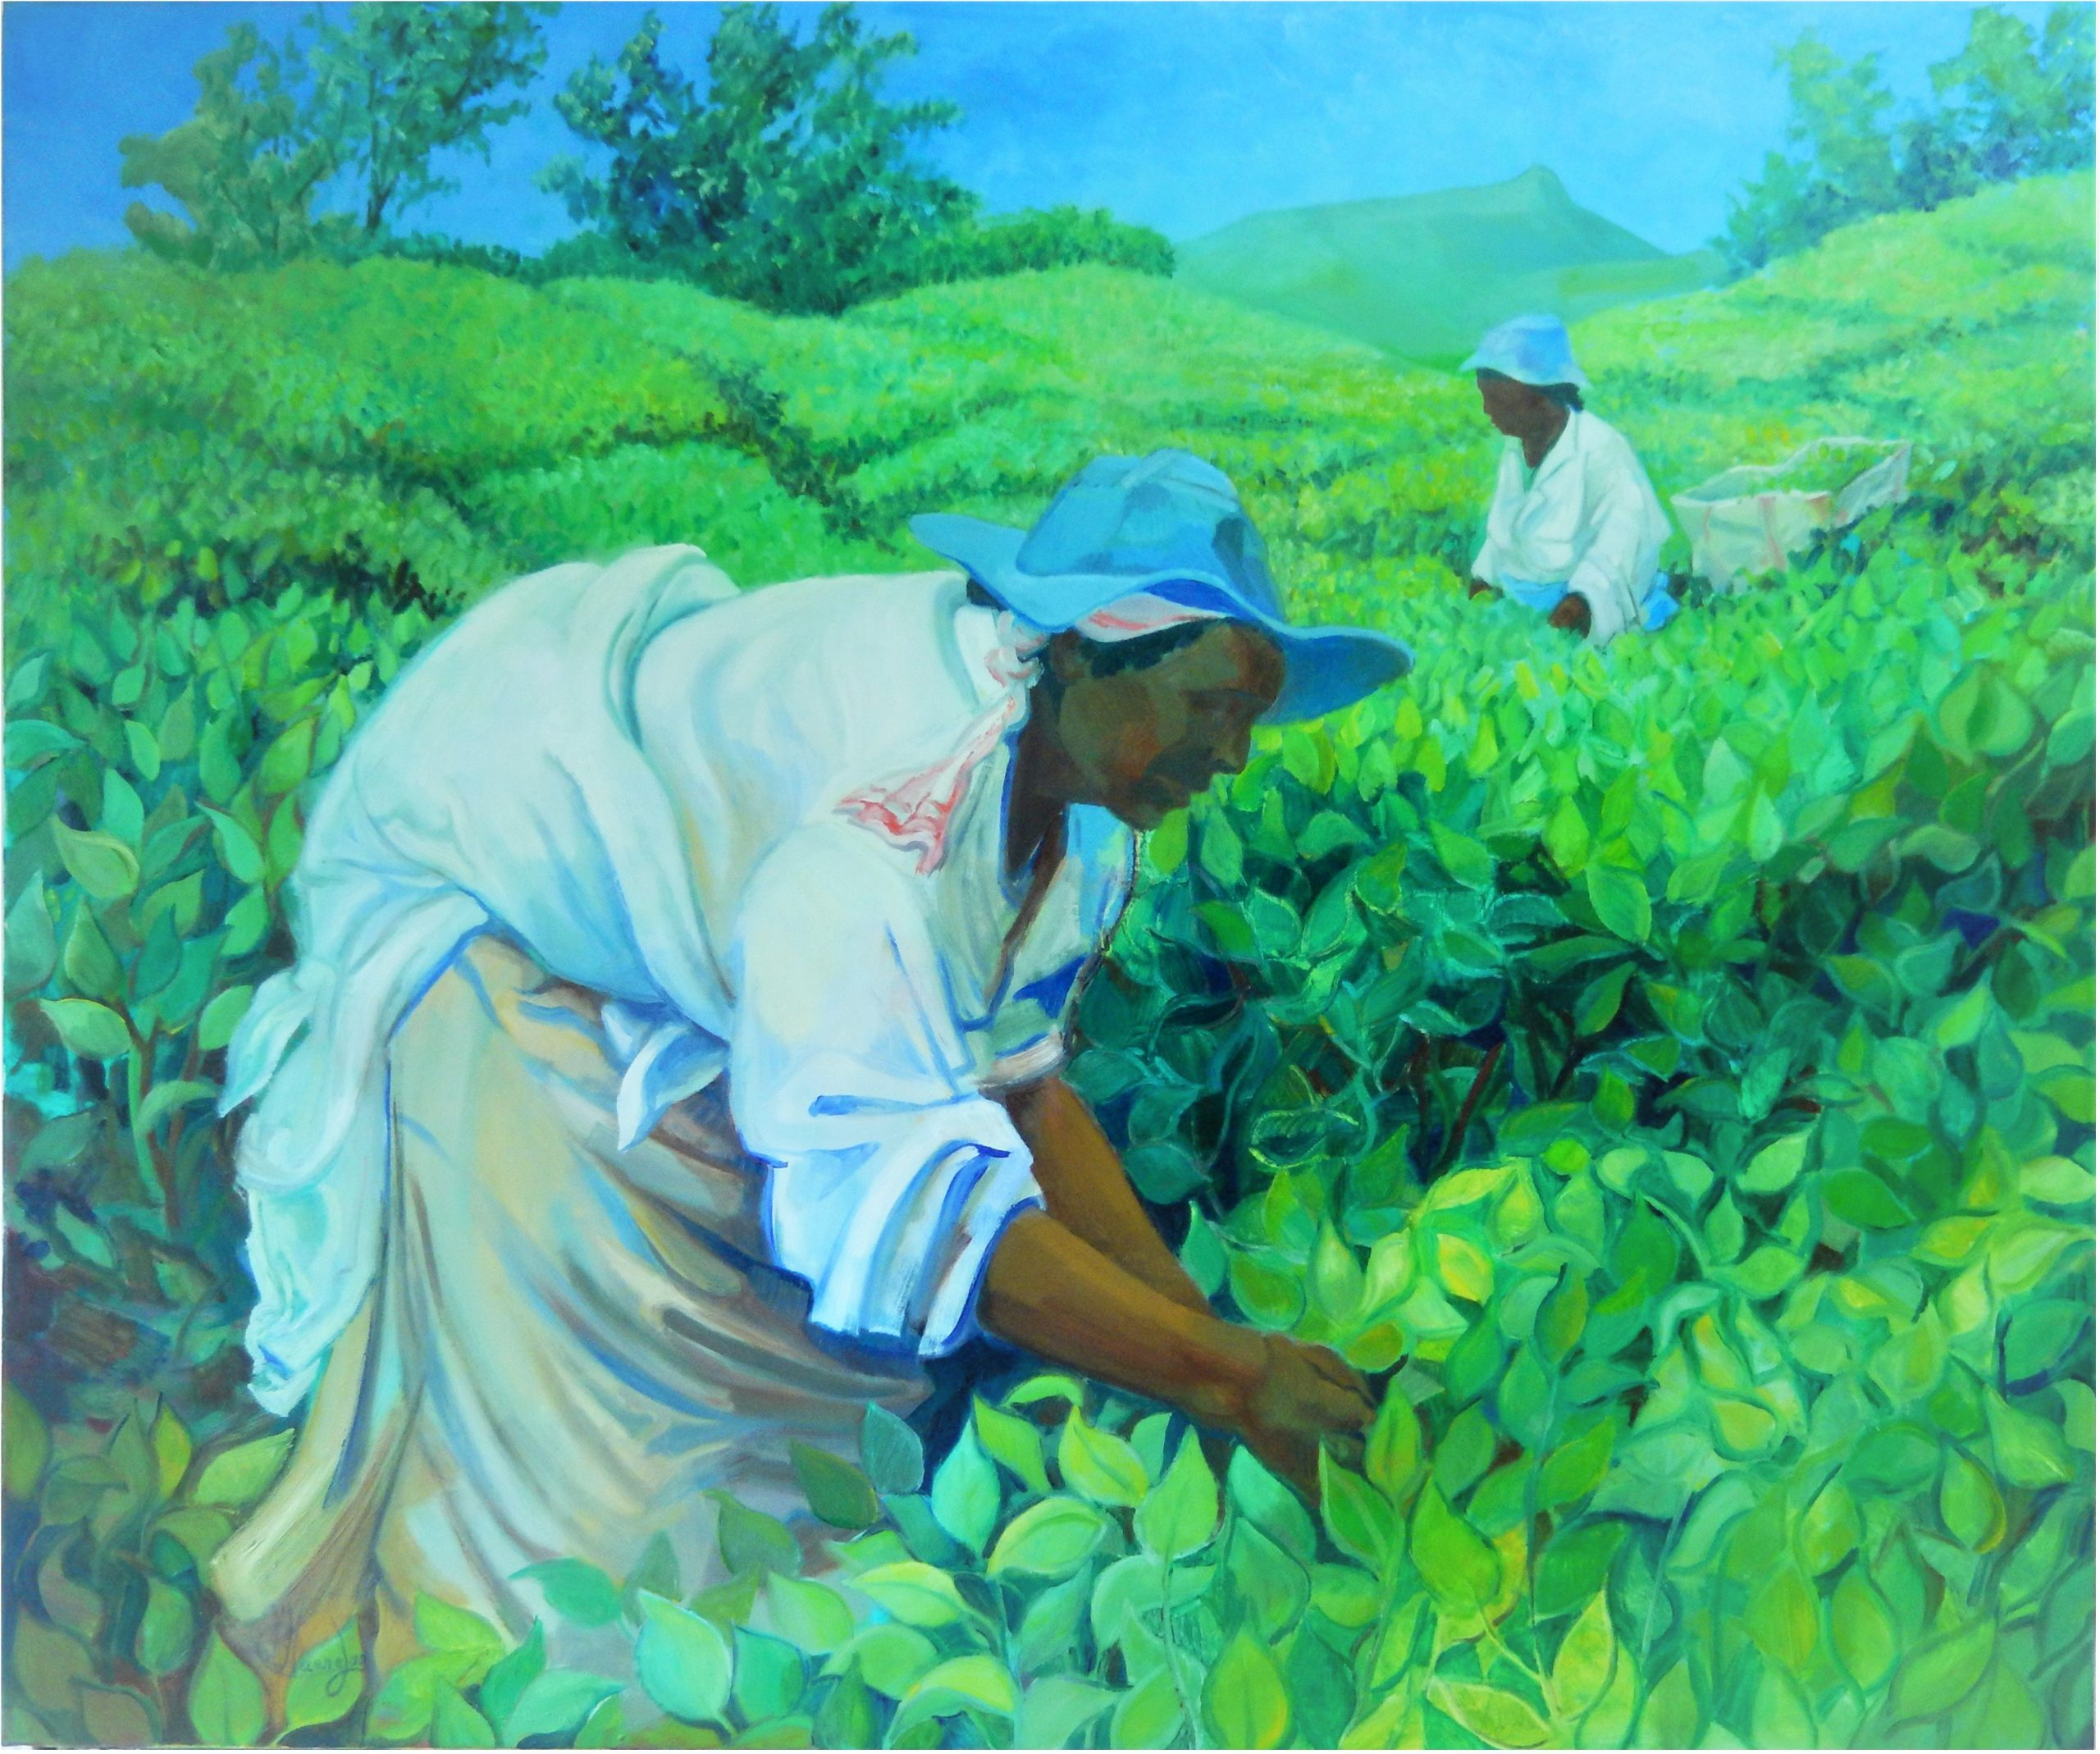 632 ceuilleuzes de thé